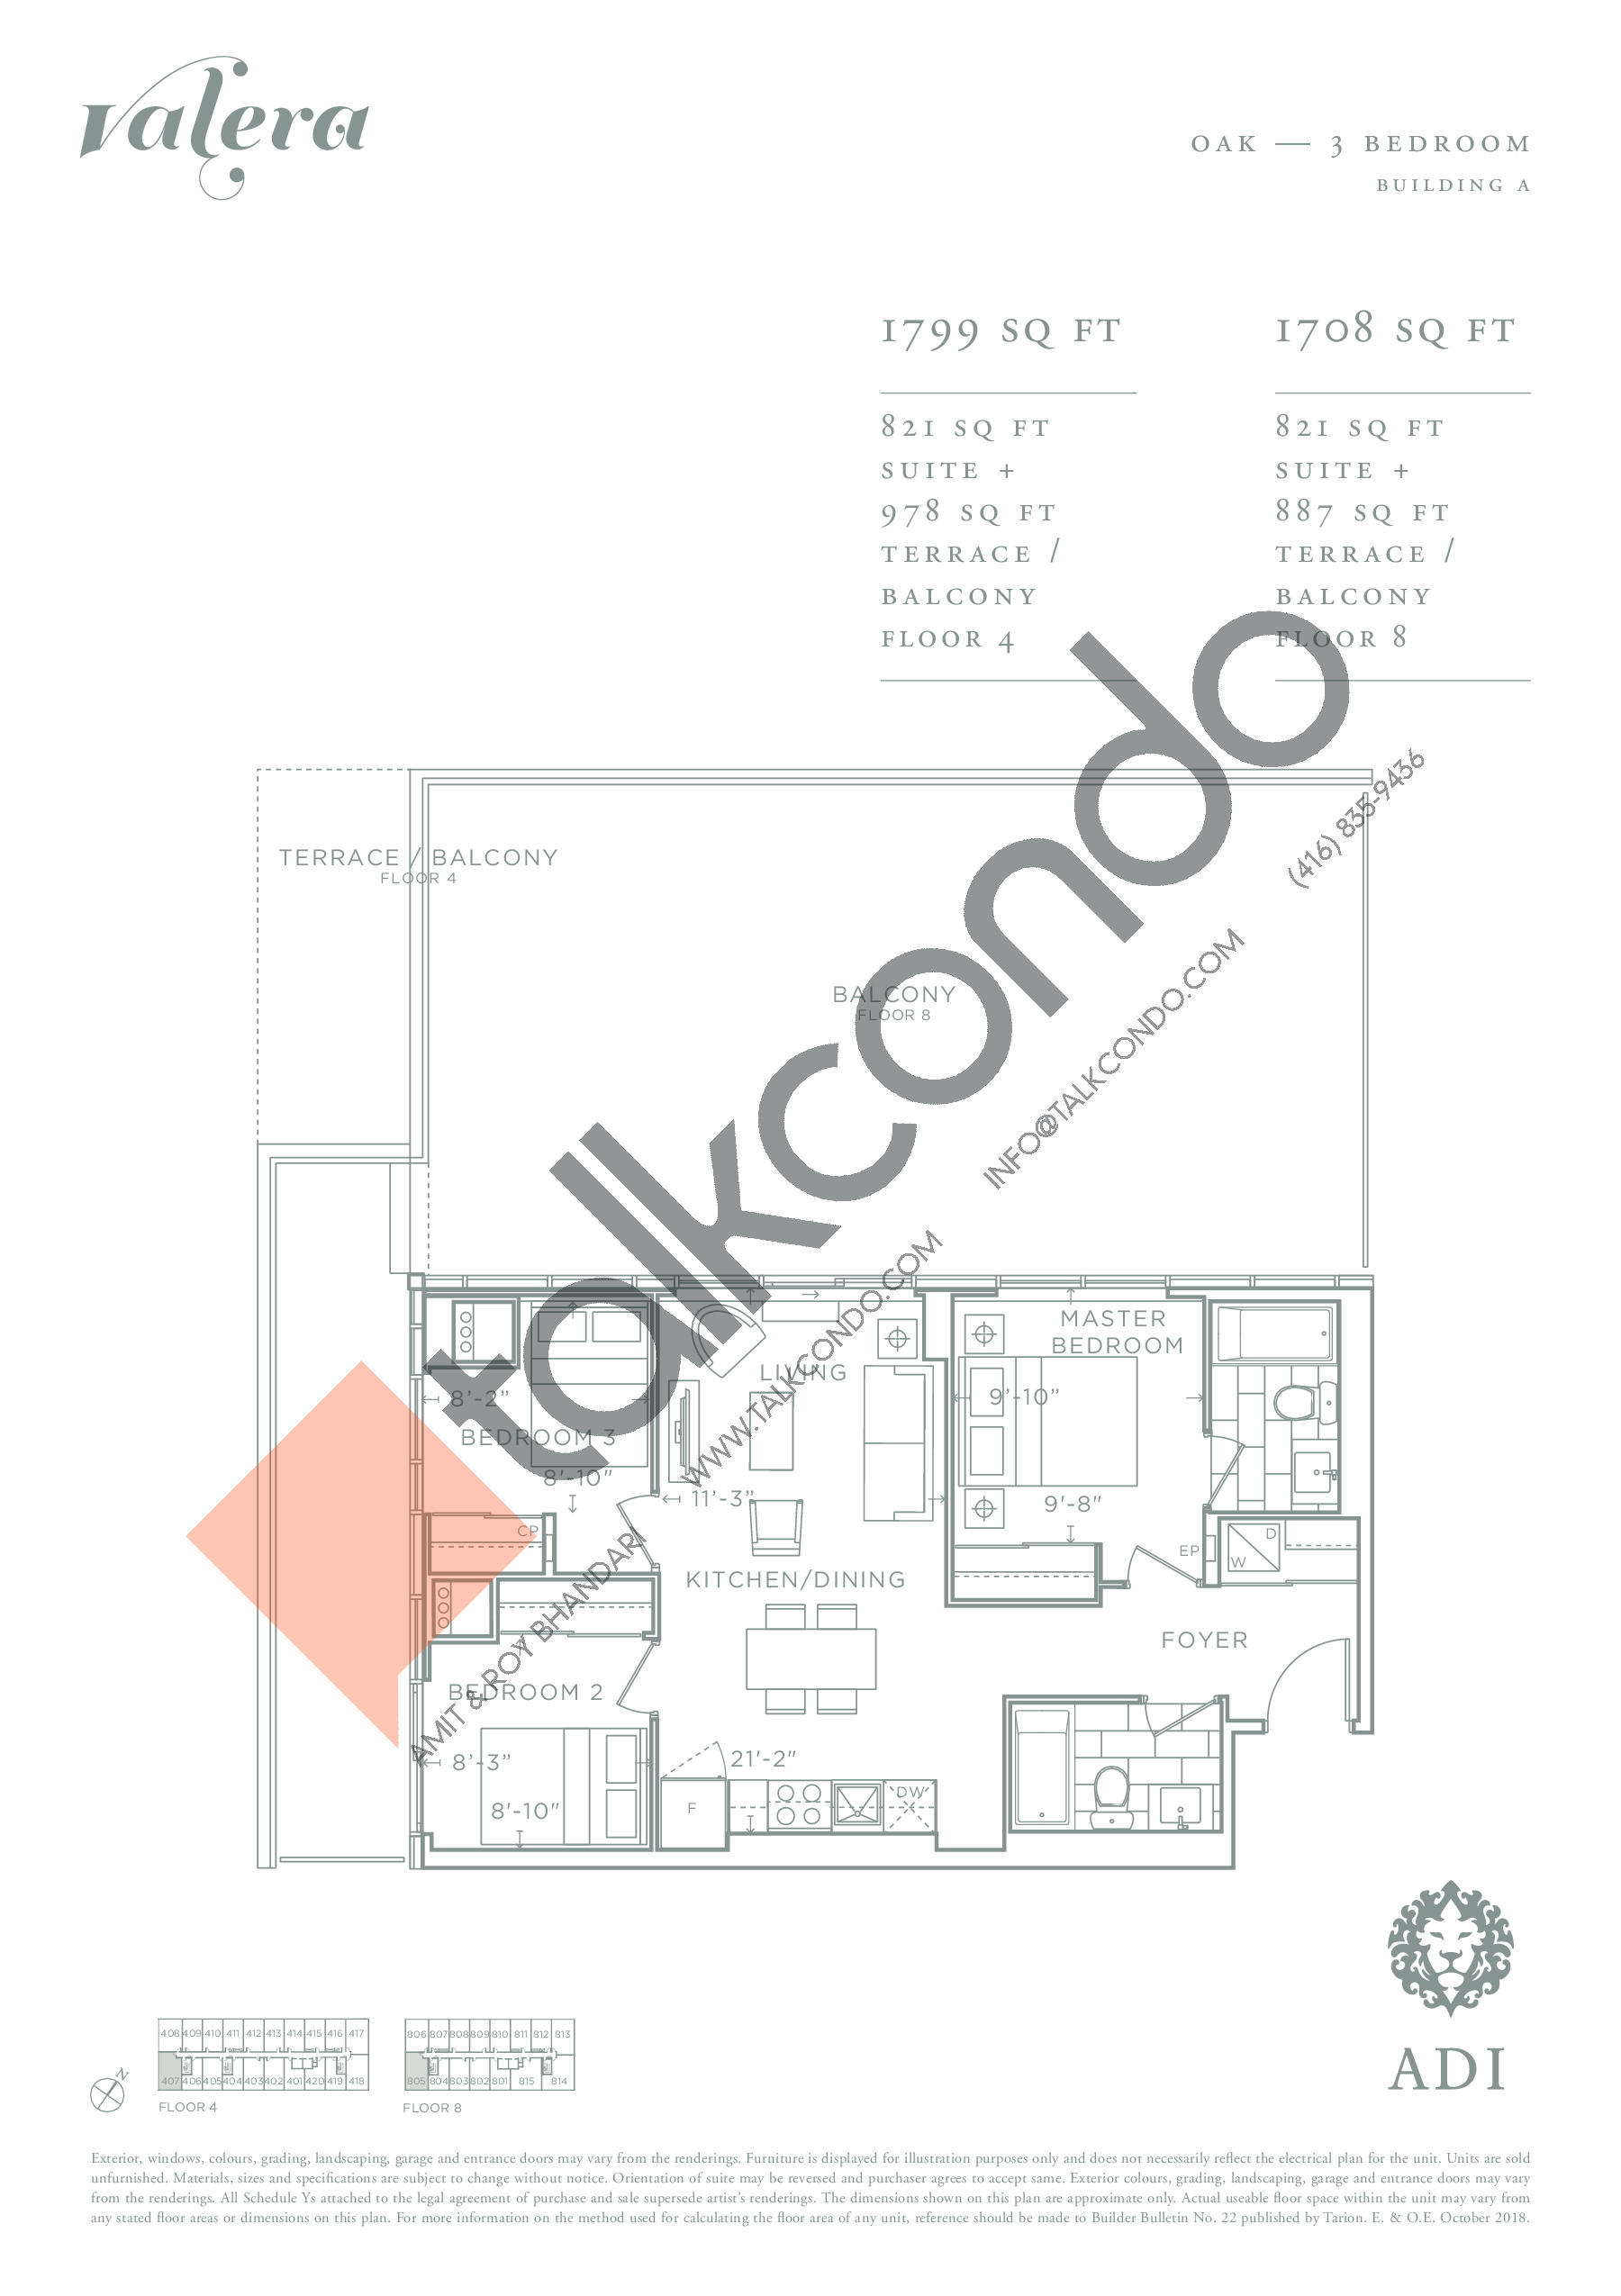 Oak Floor Plan at Valera Condos - 821 sq.ft